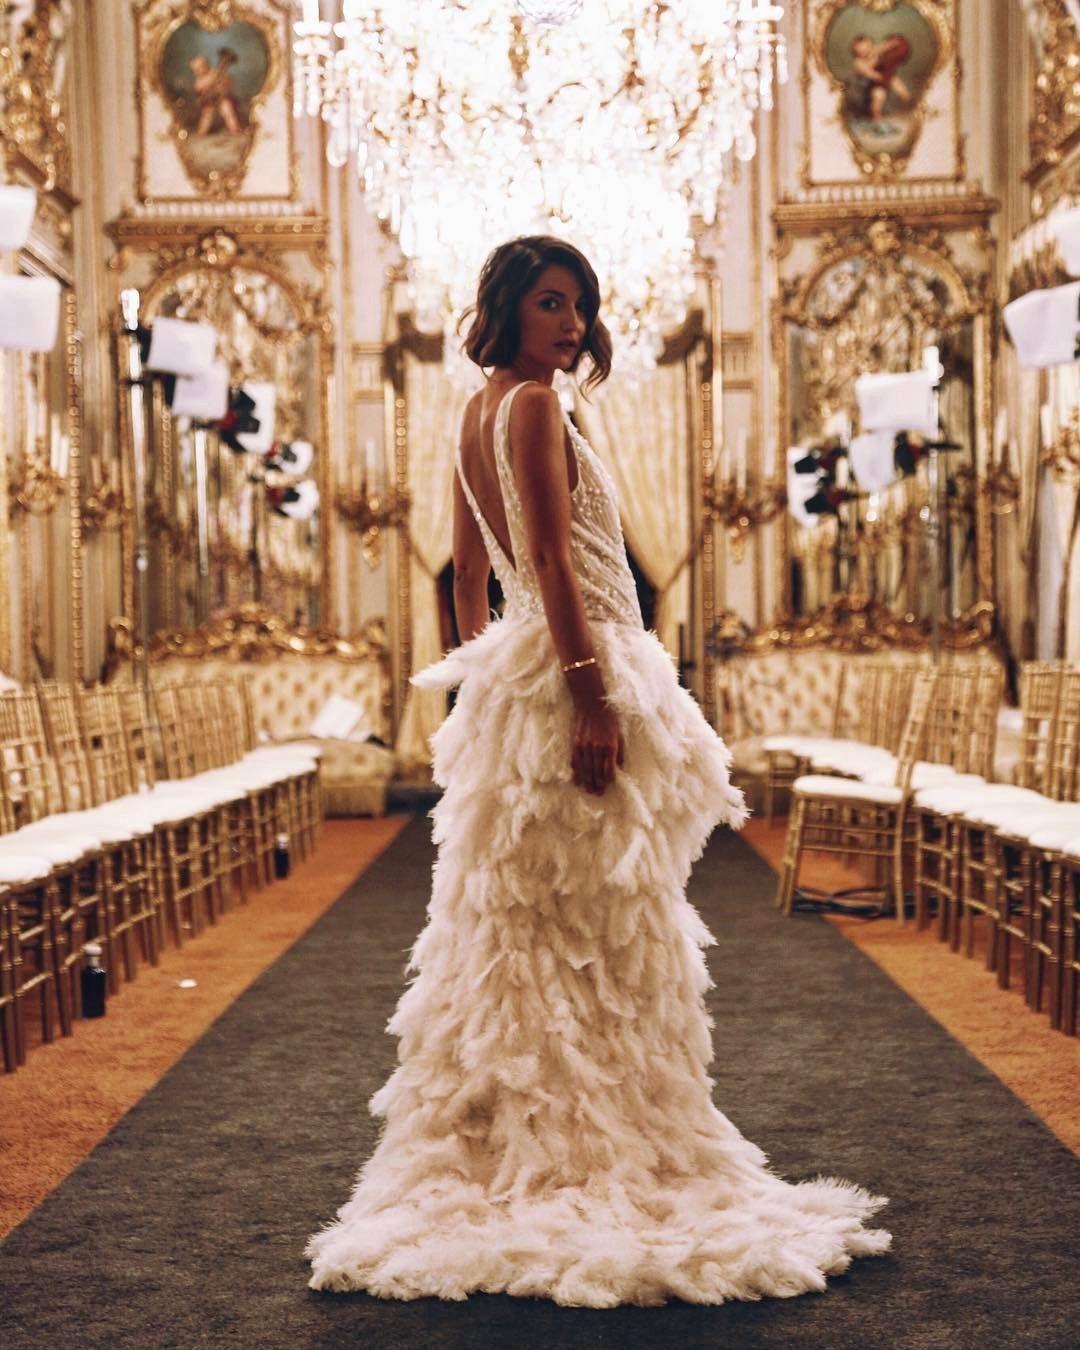 Trying on wedding dresses for the first time  Alexandra Pereira lovelypepa u Photos et vidéos Instagram